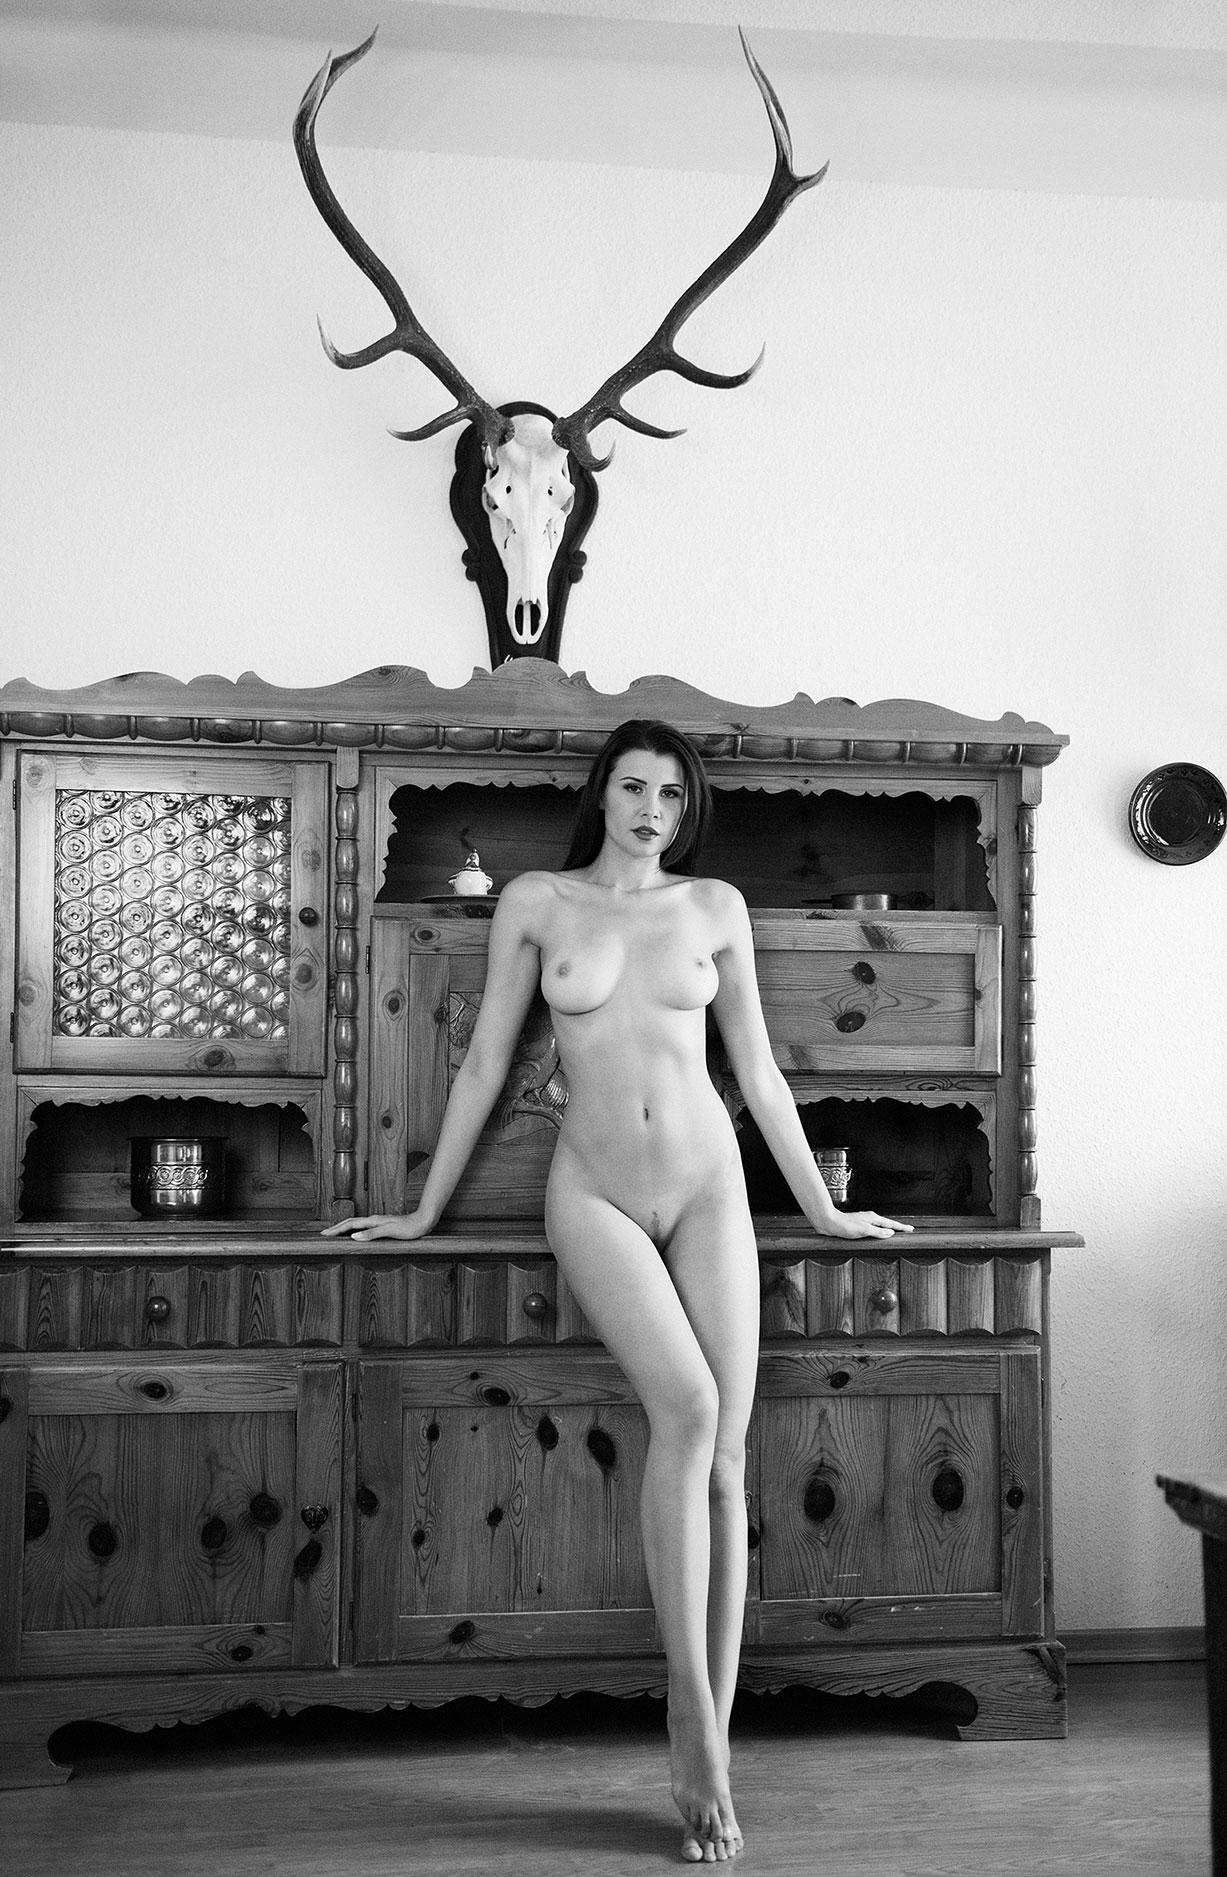 Обнаженная девушка в домике в горах / Bring Me Edelweiss by Martin Wieland